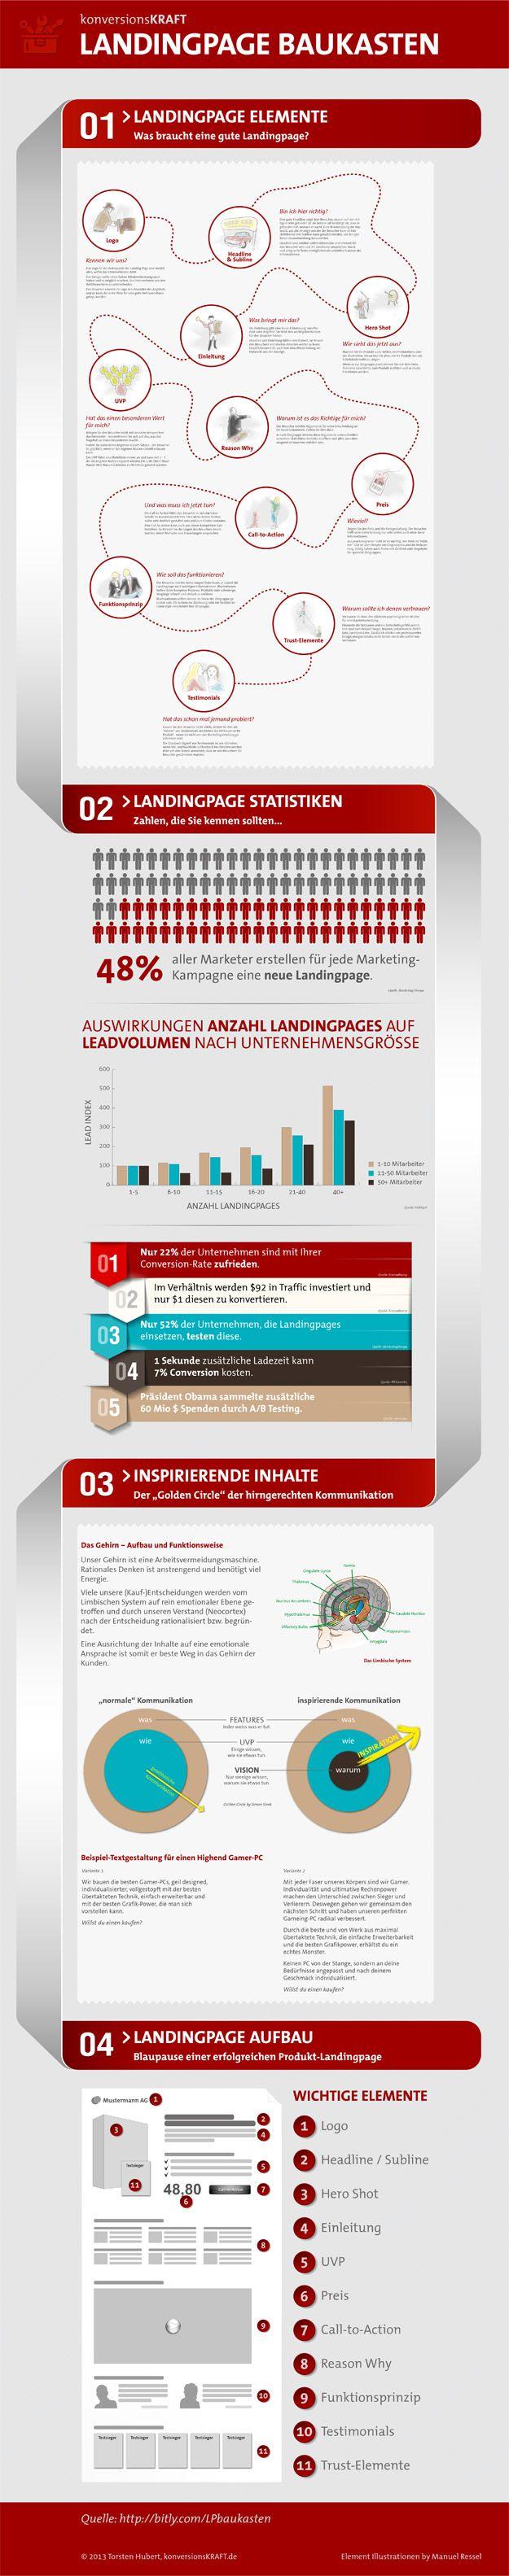 Landingpage Baukasten - Infografik mit Elementen einer Landig Page